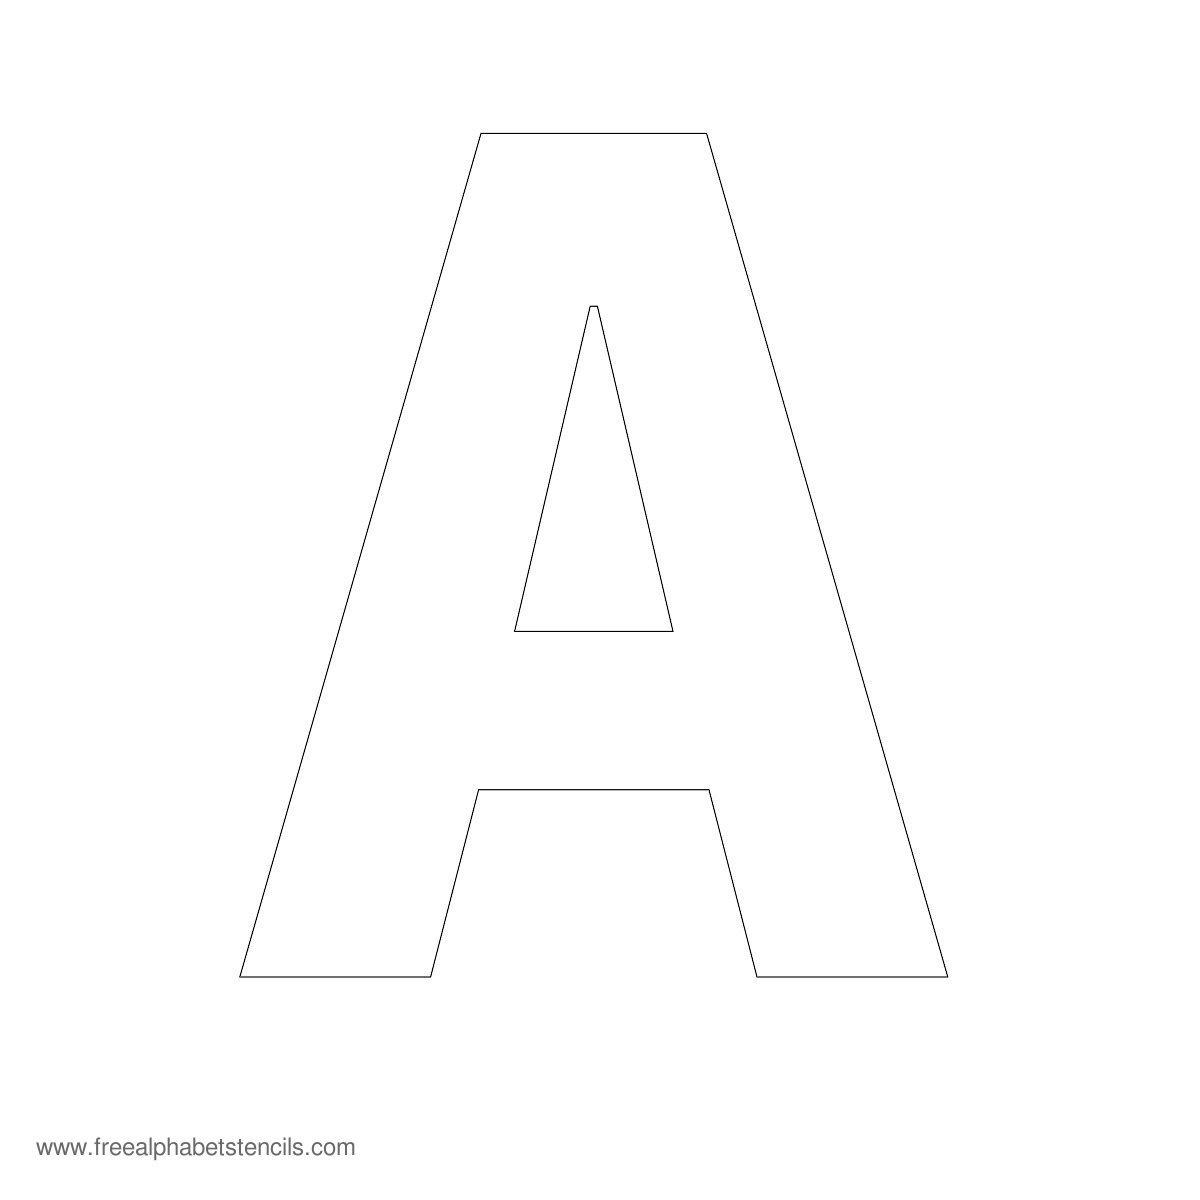 Large Alphabet Stencils | Freealphabetstencils - Free Printable Letter Templates